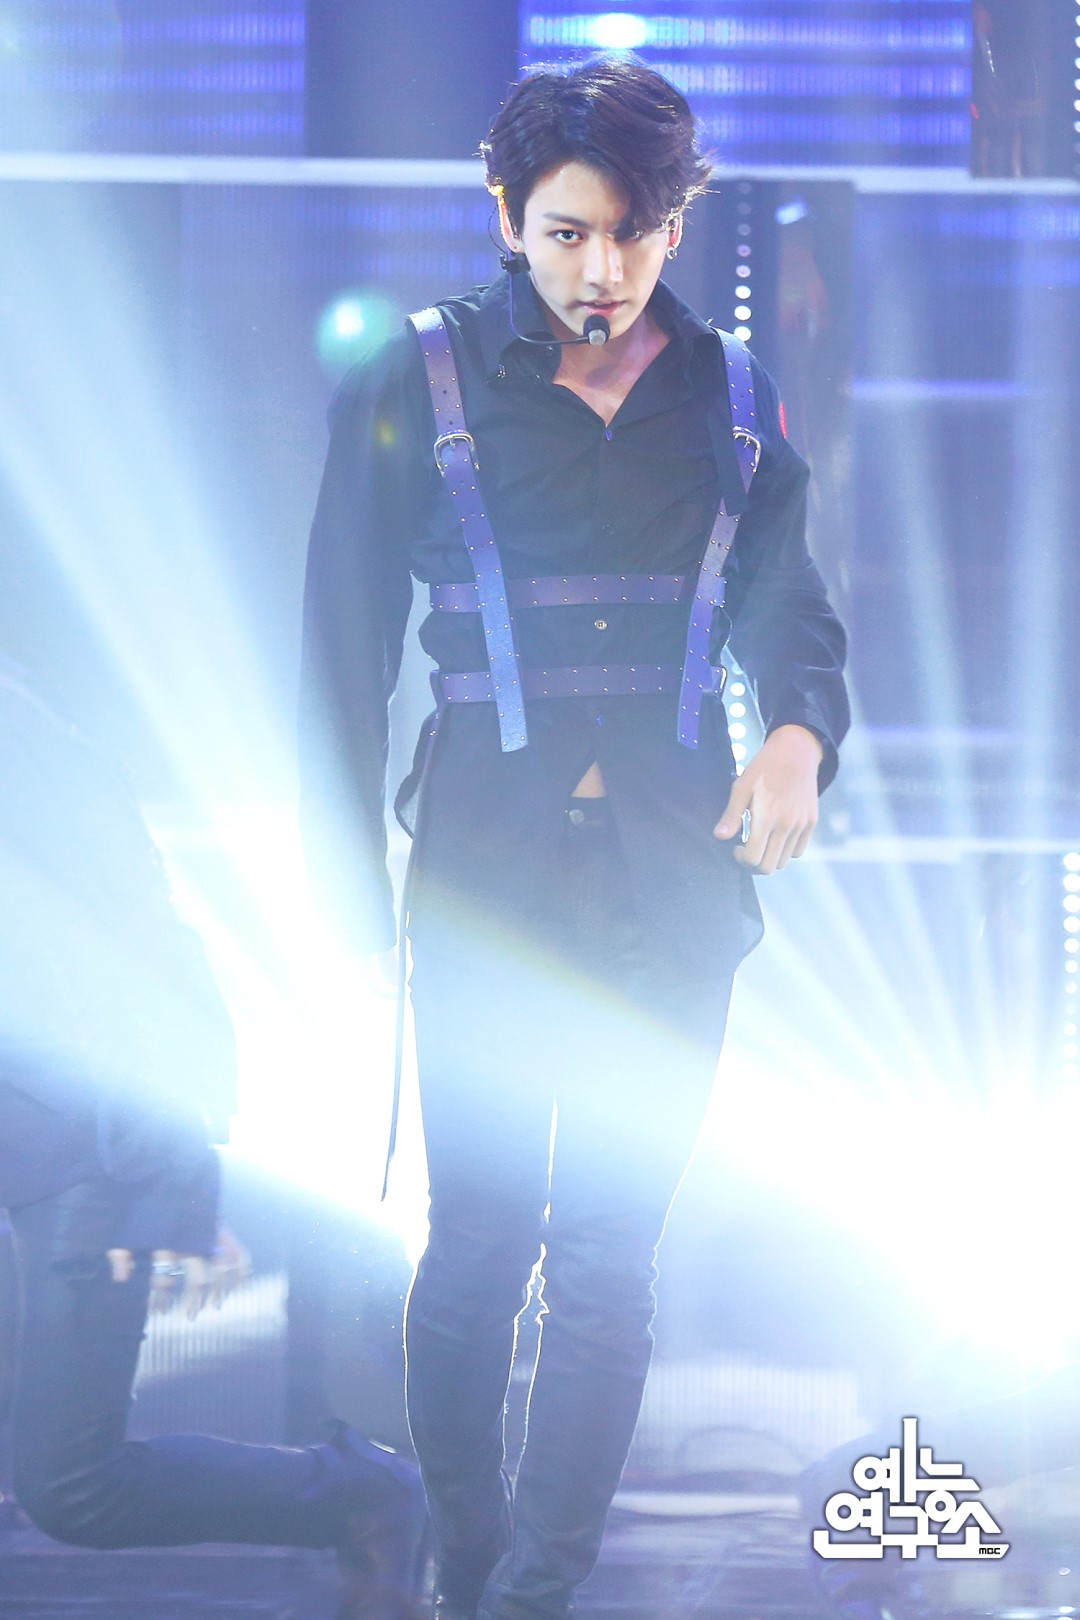 BTS Comeback Stage 2018 bts 41413982 1080 1620